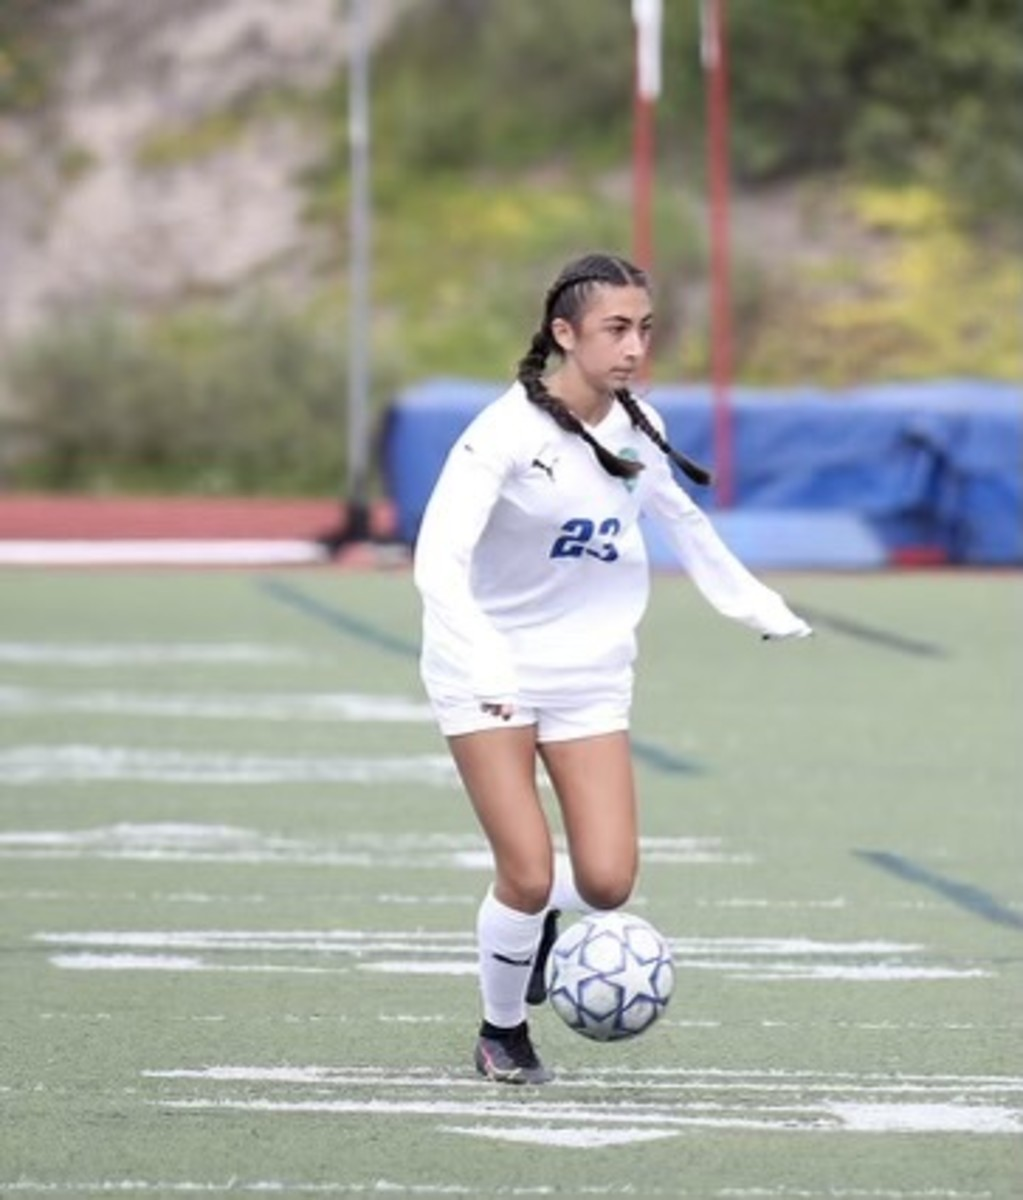 Ashley Mekitarian playing soccer. Photo courtesy George Mekitarian.